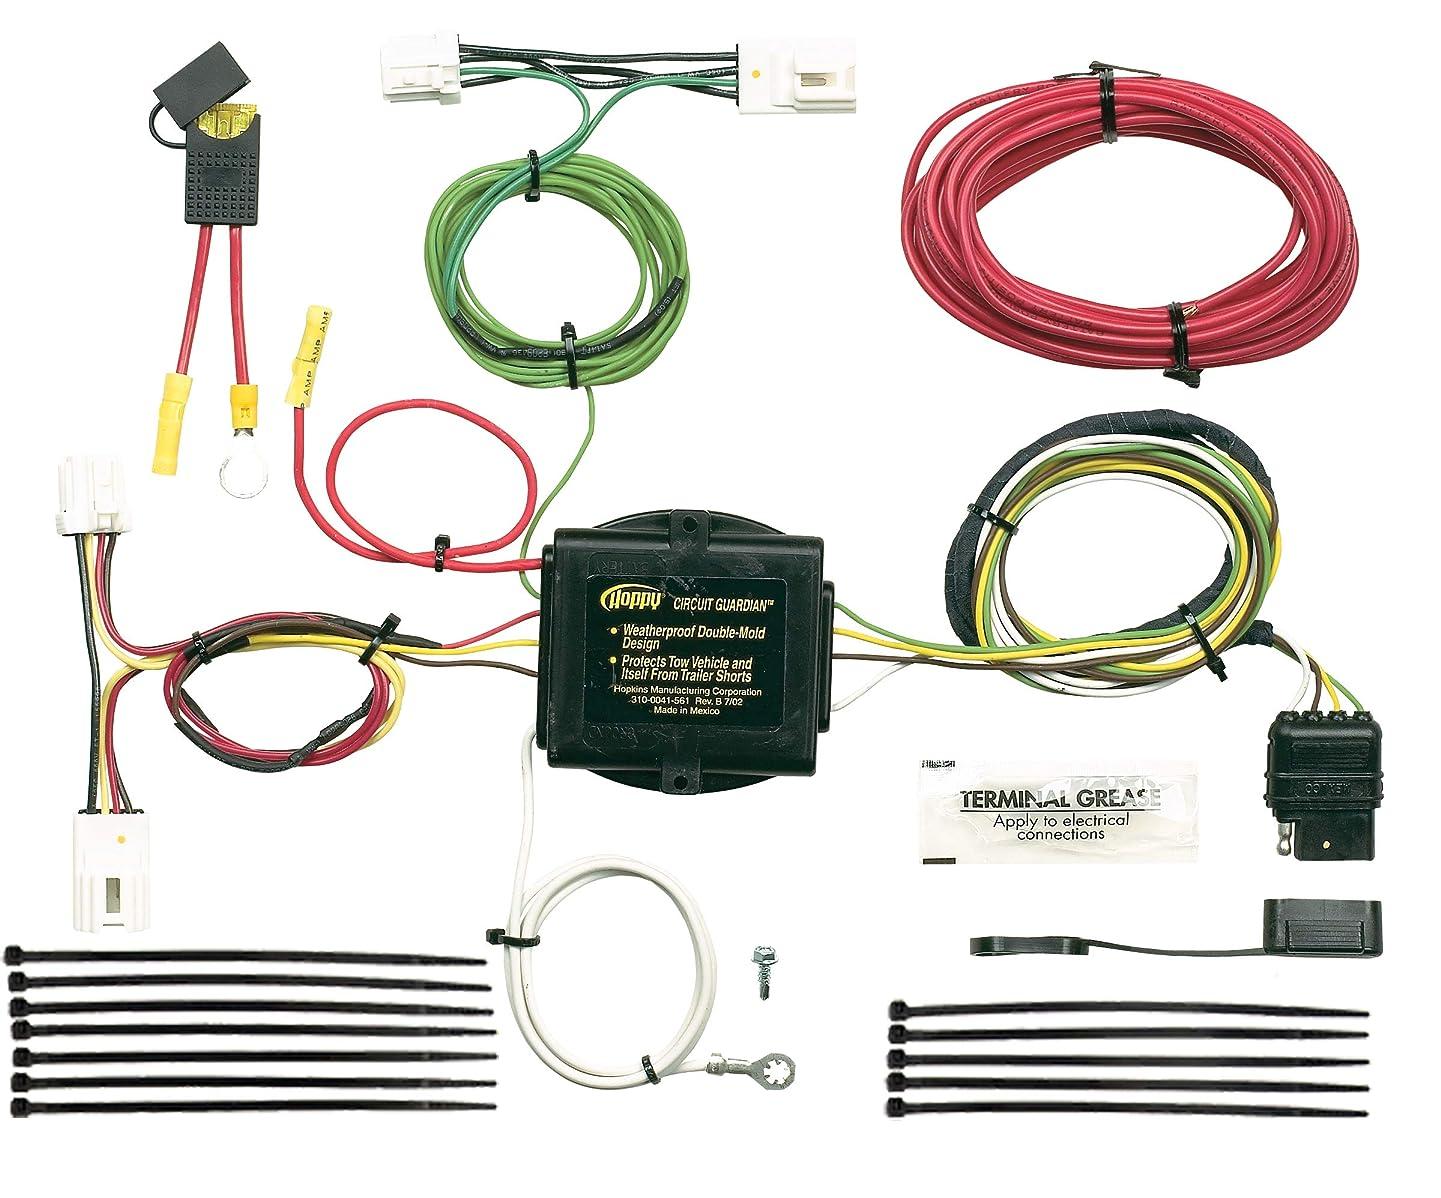 Hopkins 43625 Plug-In Simple Vehicle to Trailer Wiring Kit